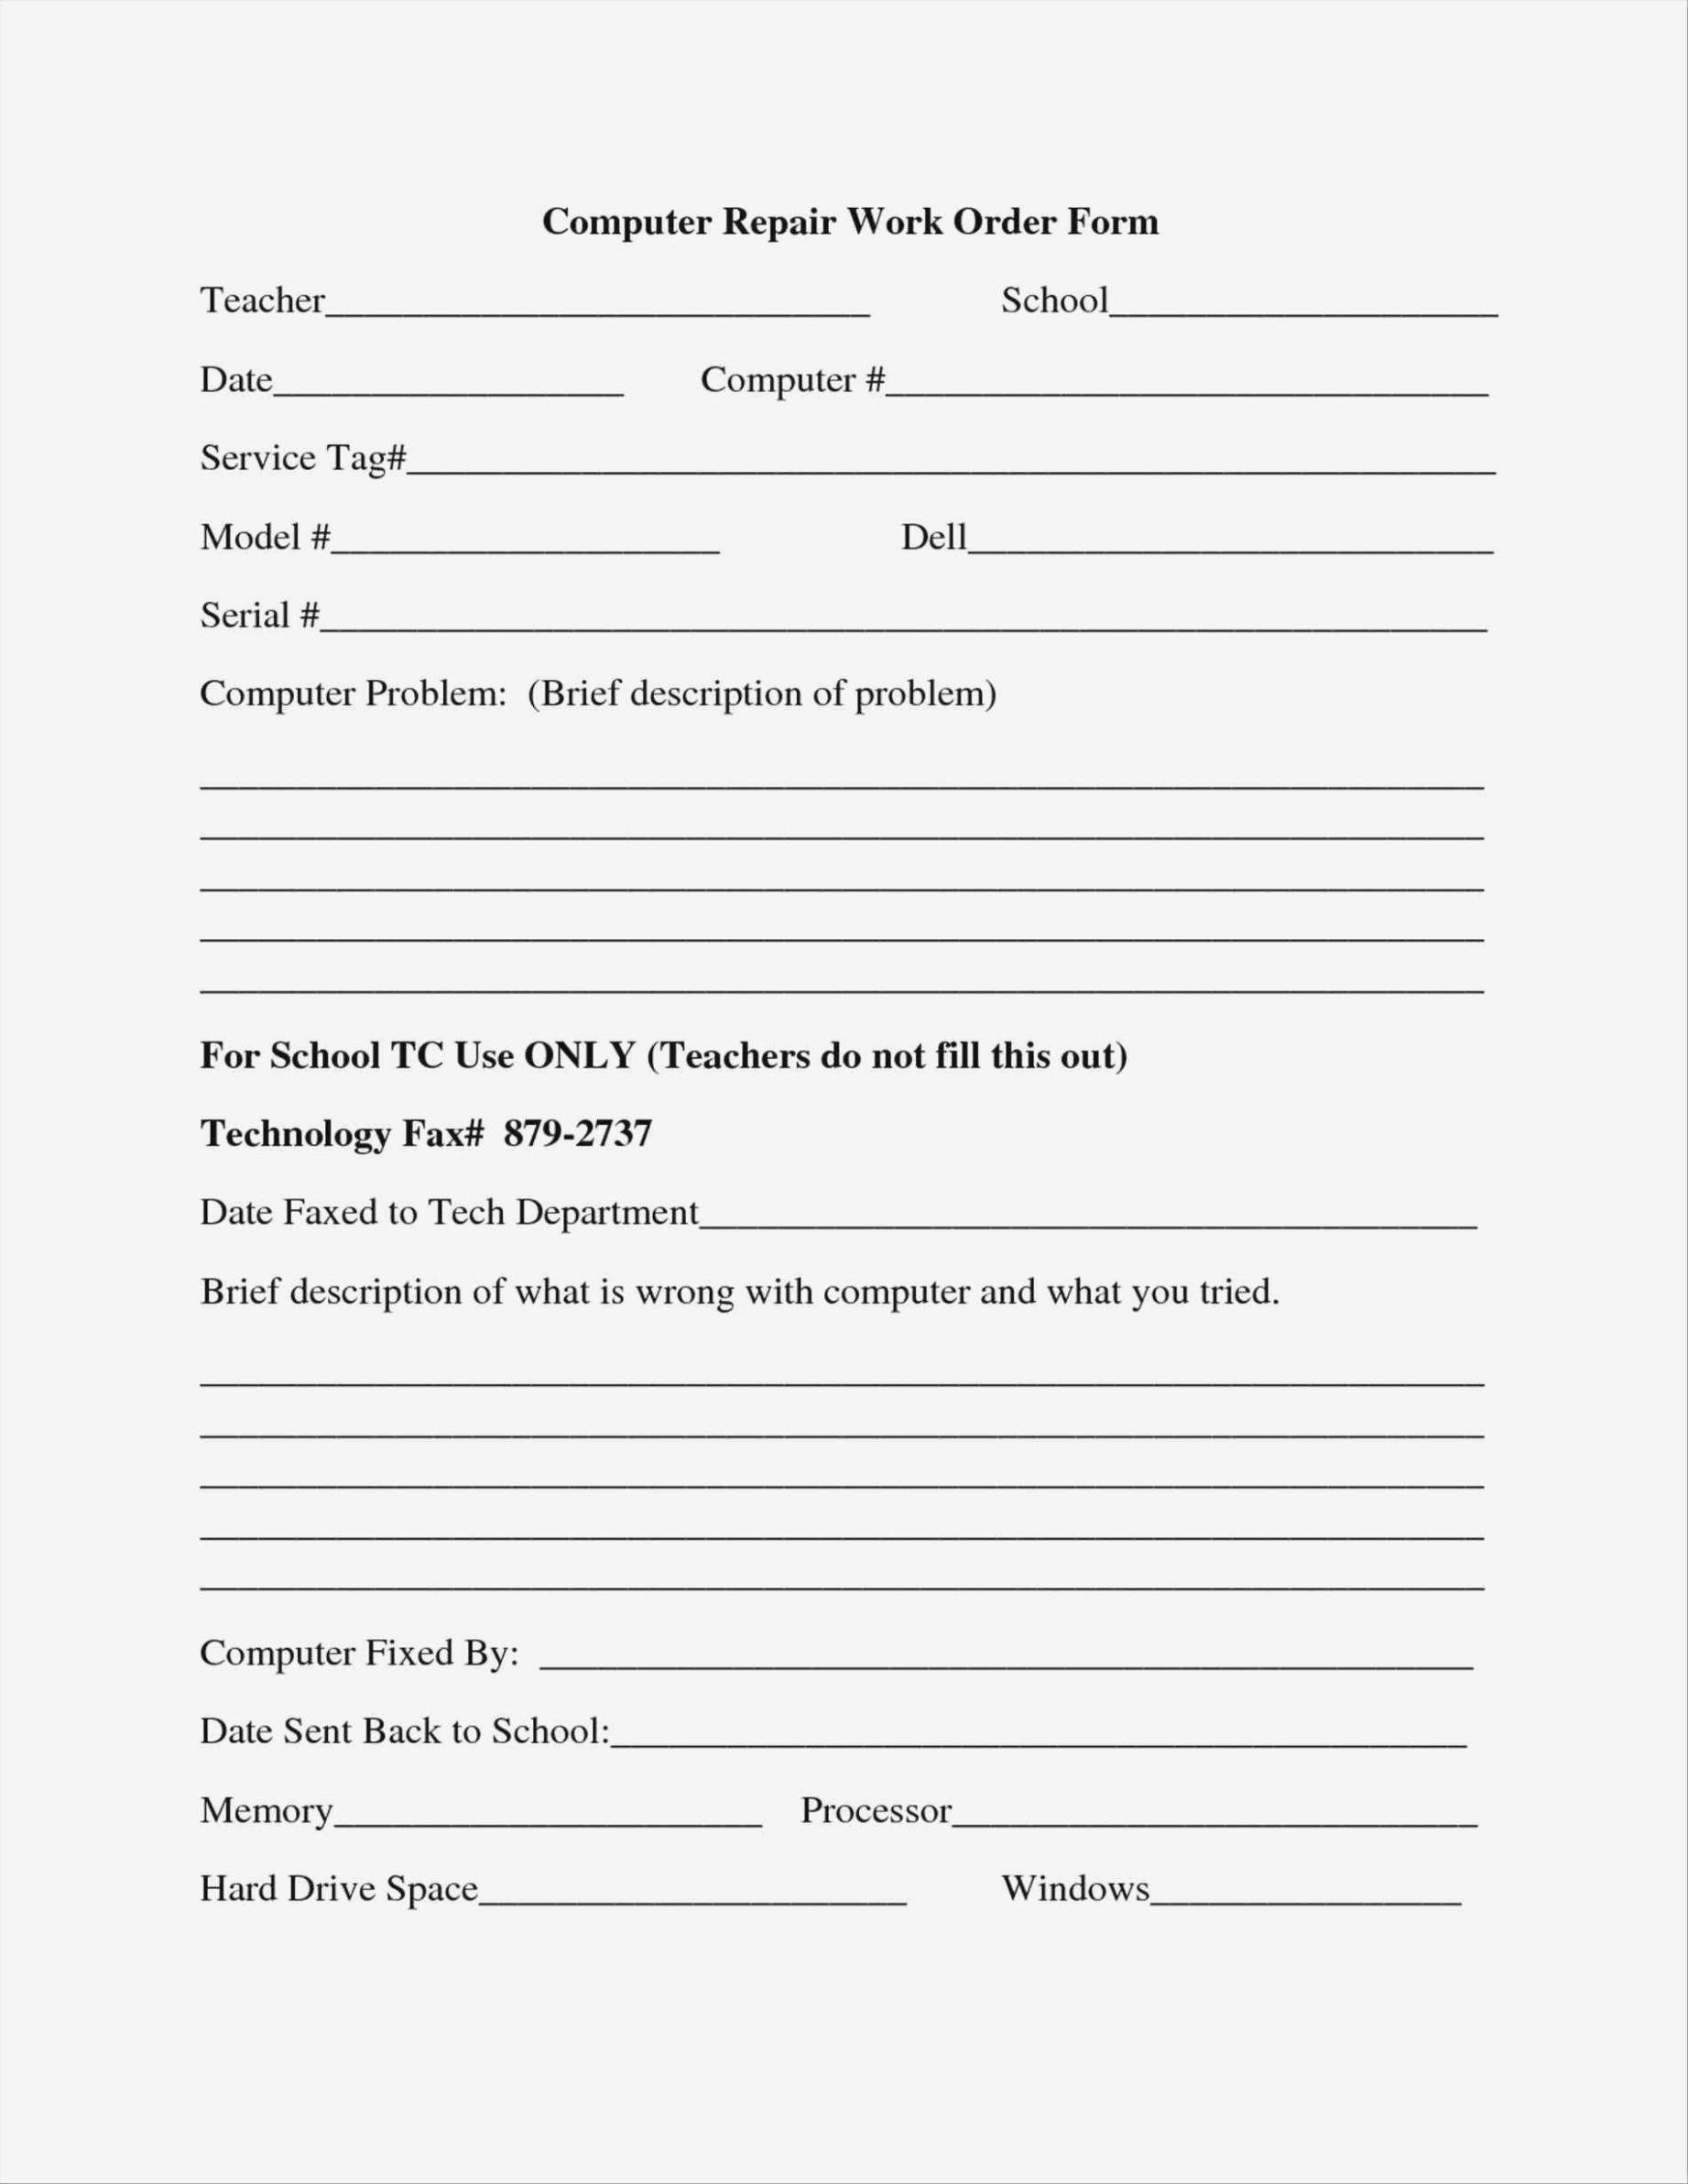 Equipment Repair Request Form Template